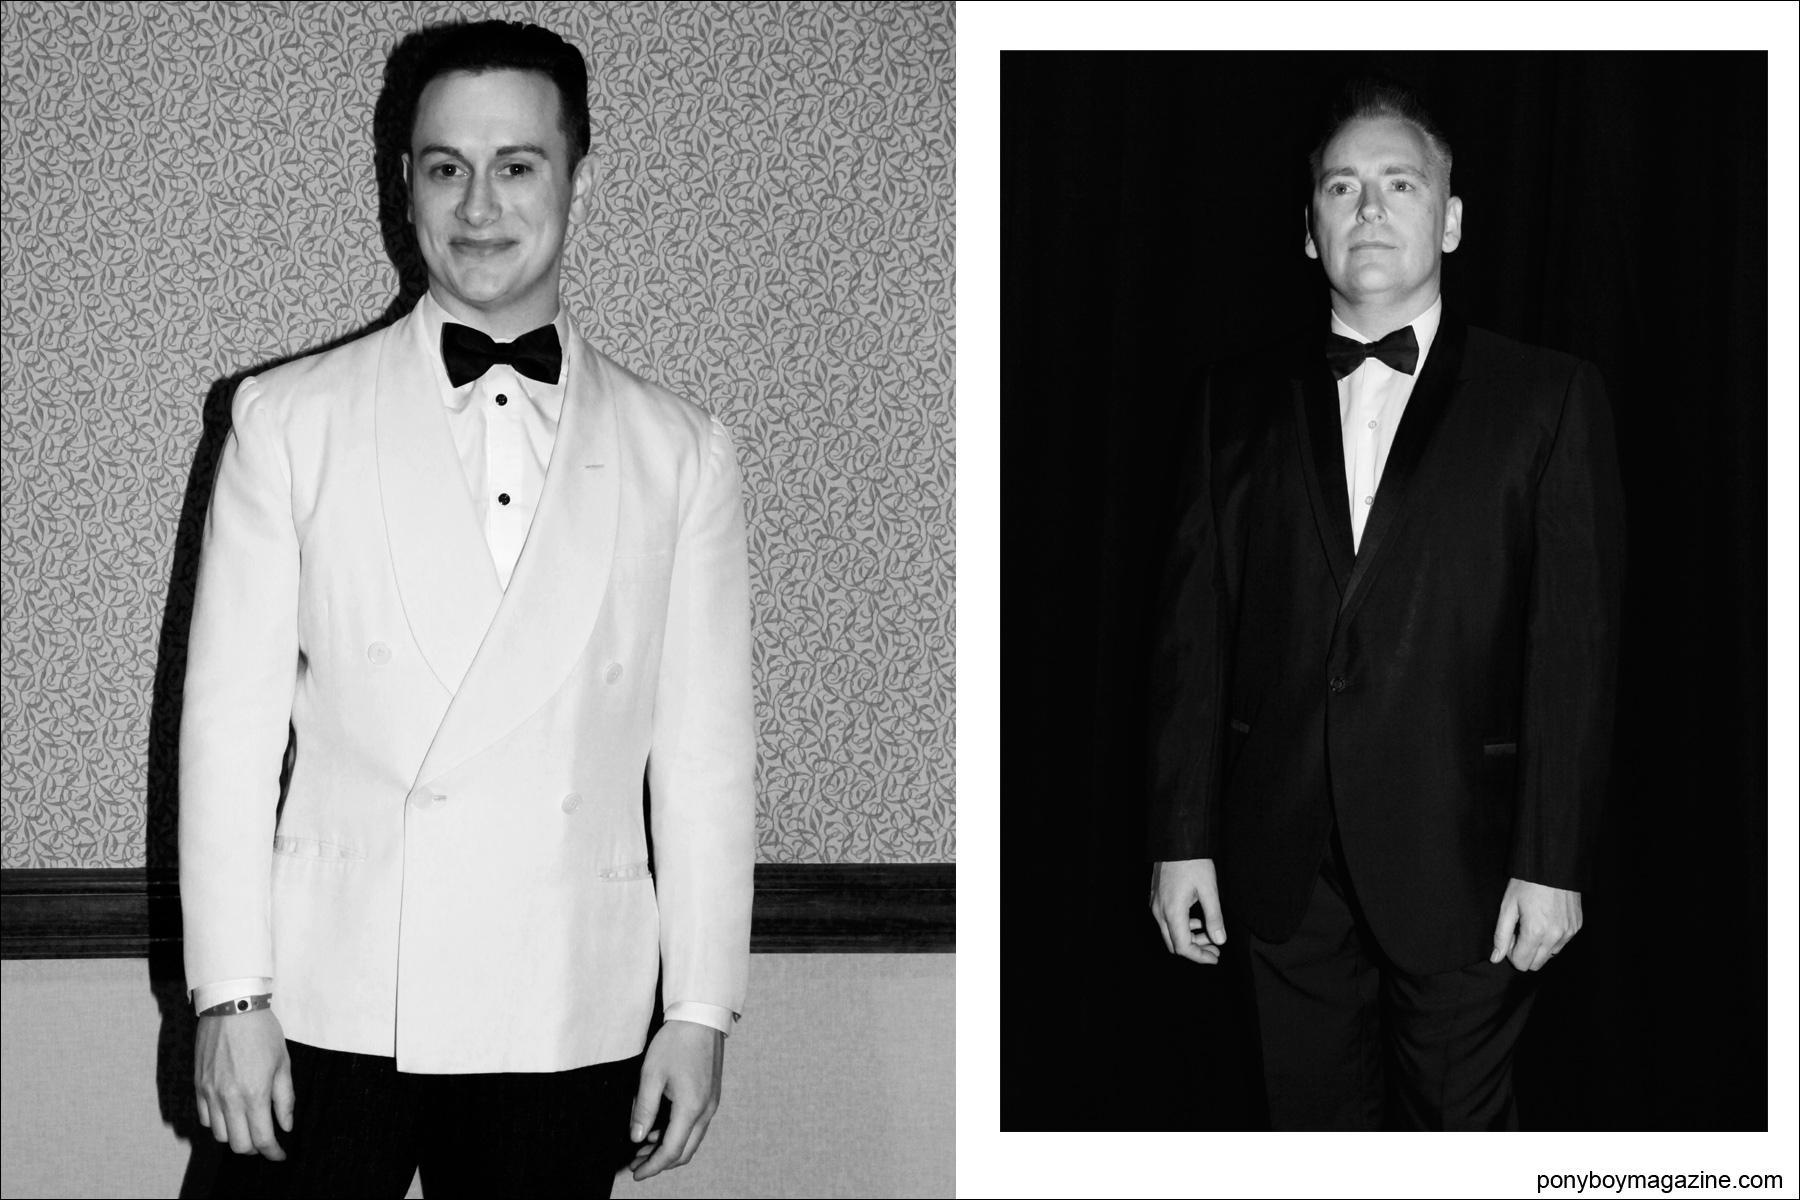 Men's vintage tuxedos photographed at Viva Las Vegas rockabilly weekender by Alexander Thompson for Ponyboy Magazine.